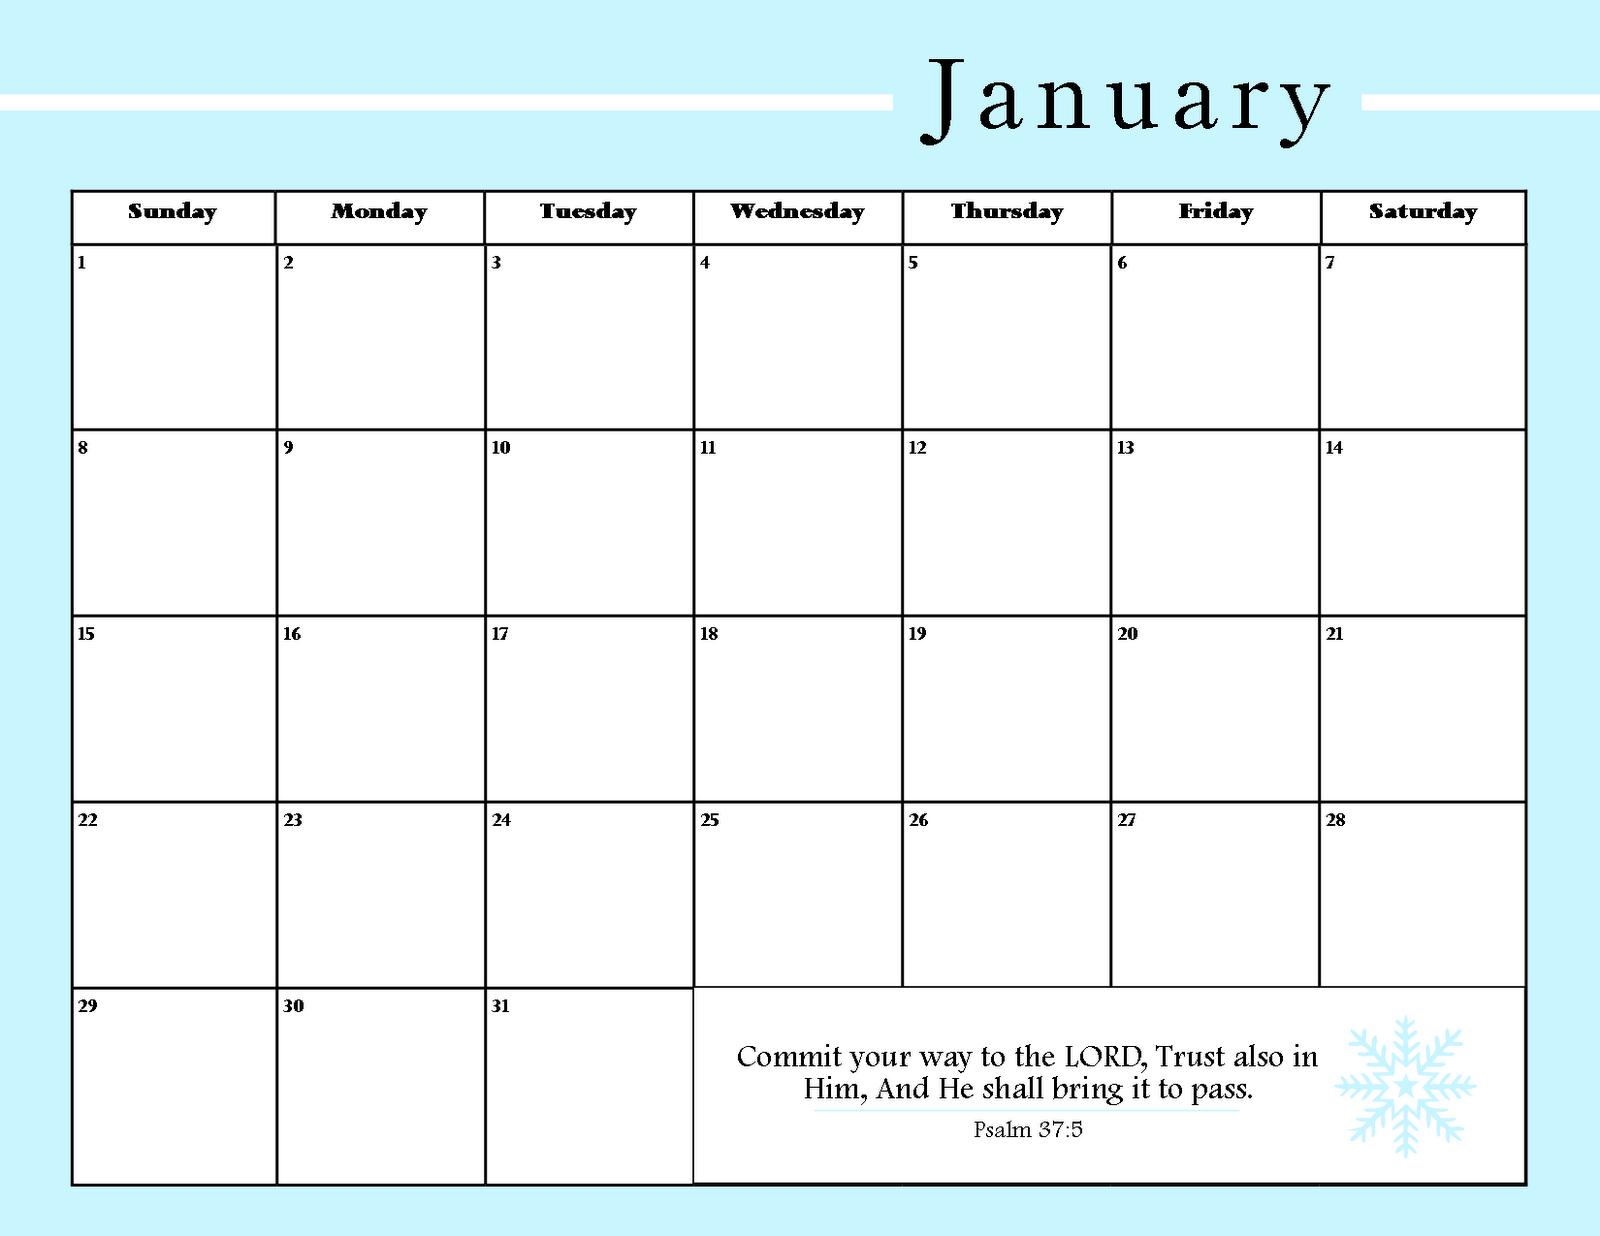 ... january 2012 calendar 371 x 480 69 kb jpeg calendar numbers 1 31